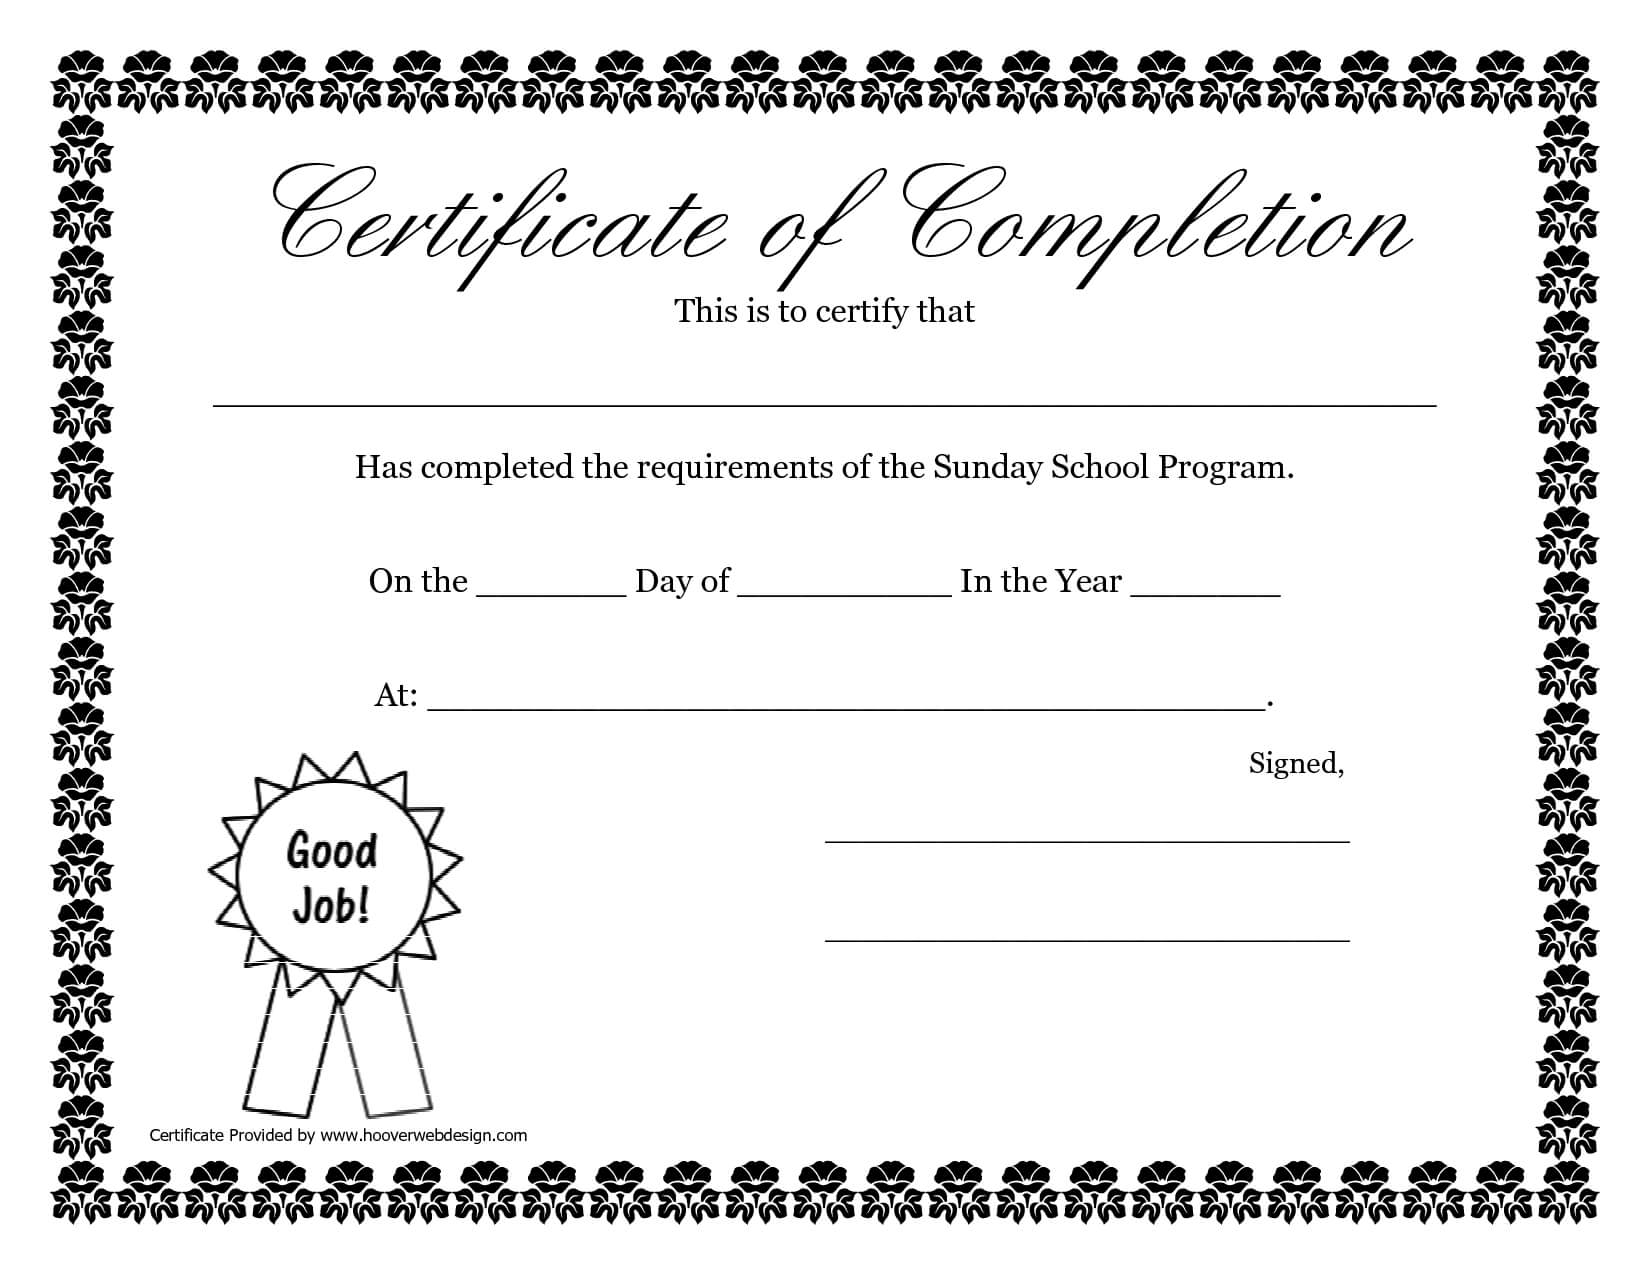 Pdf Free Certificate Templates Inside Certificate Templates For School